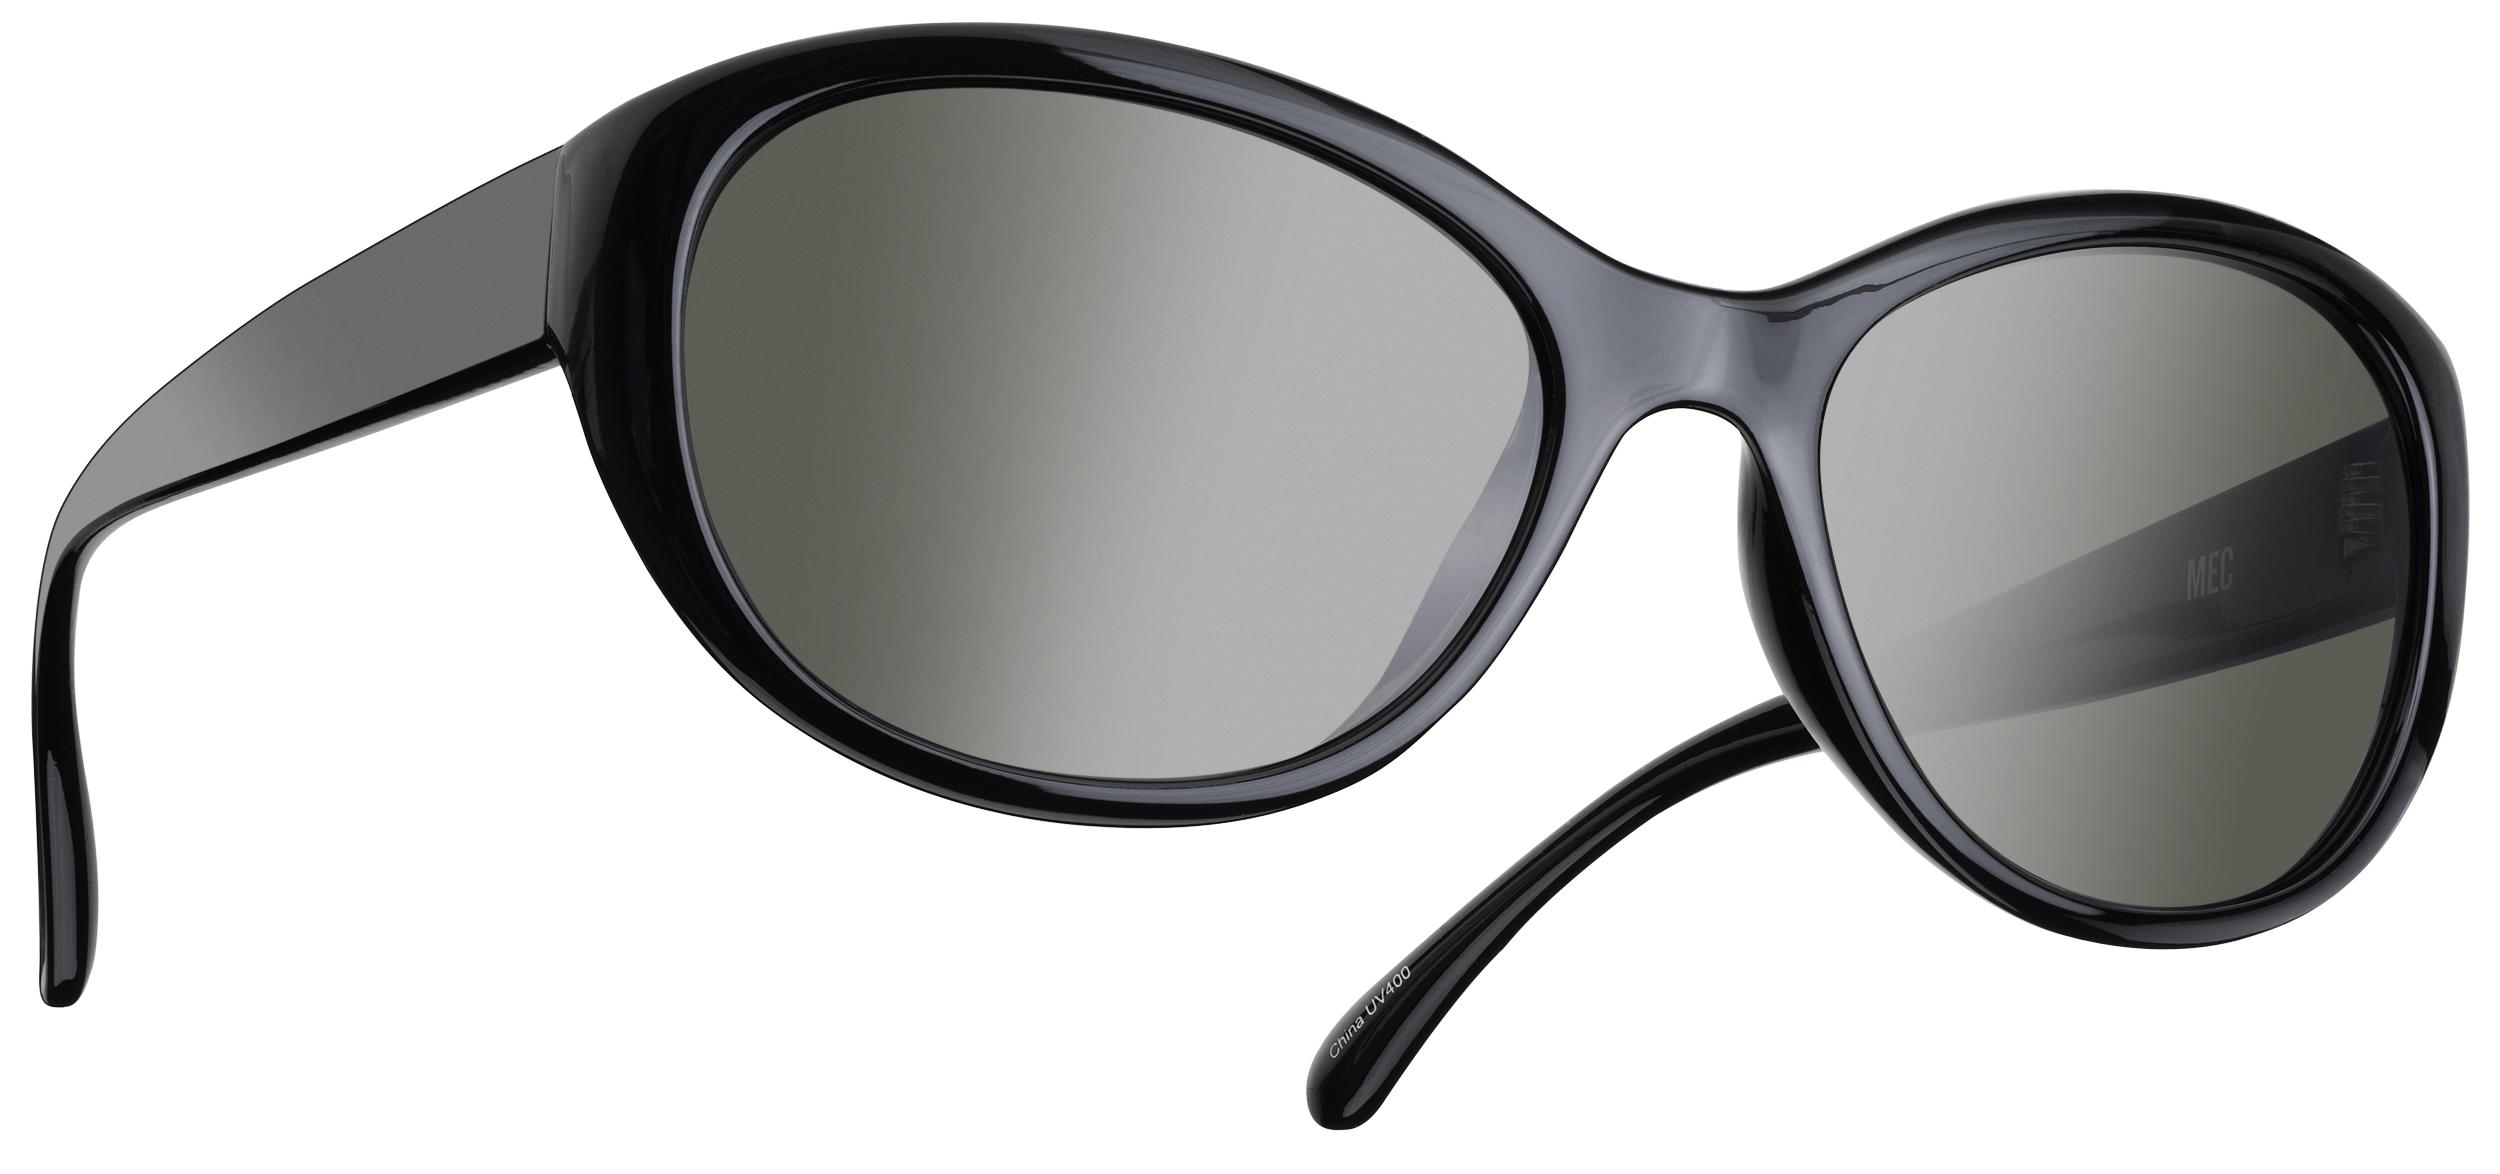 5224ddeb9a MEC Katy Polarized Sunglasses - Women s